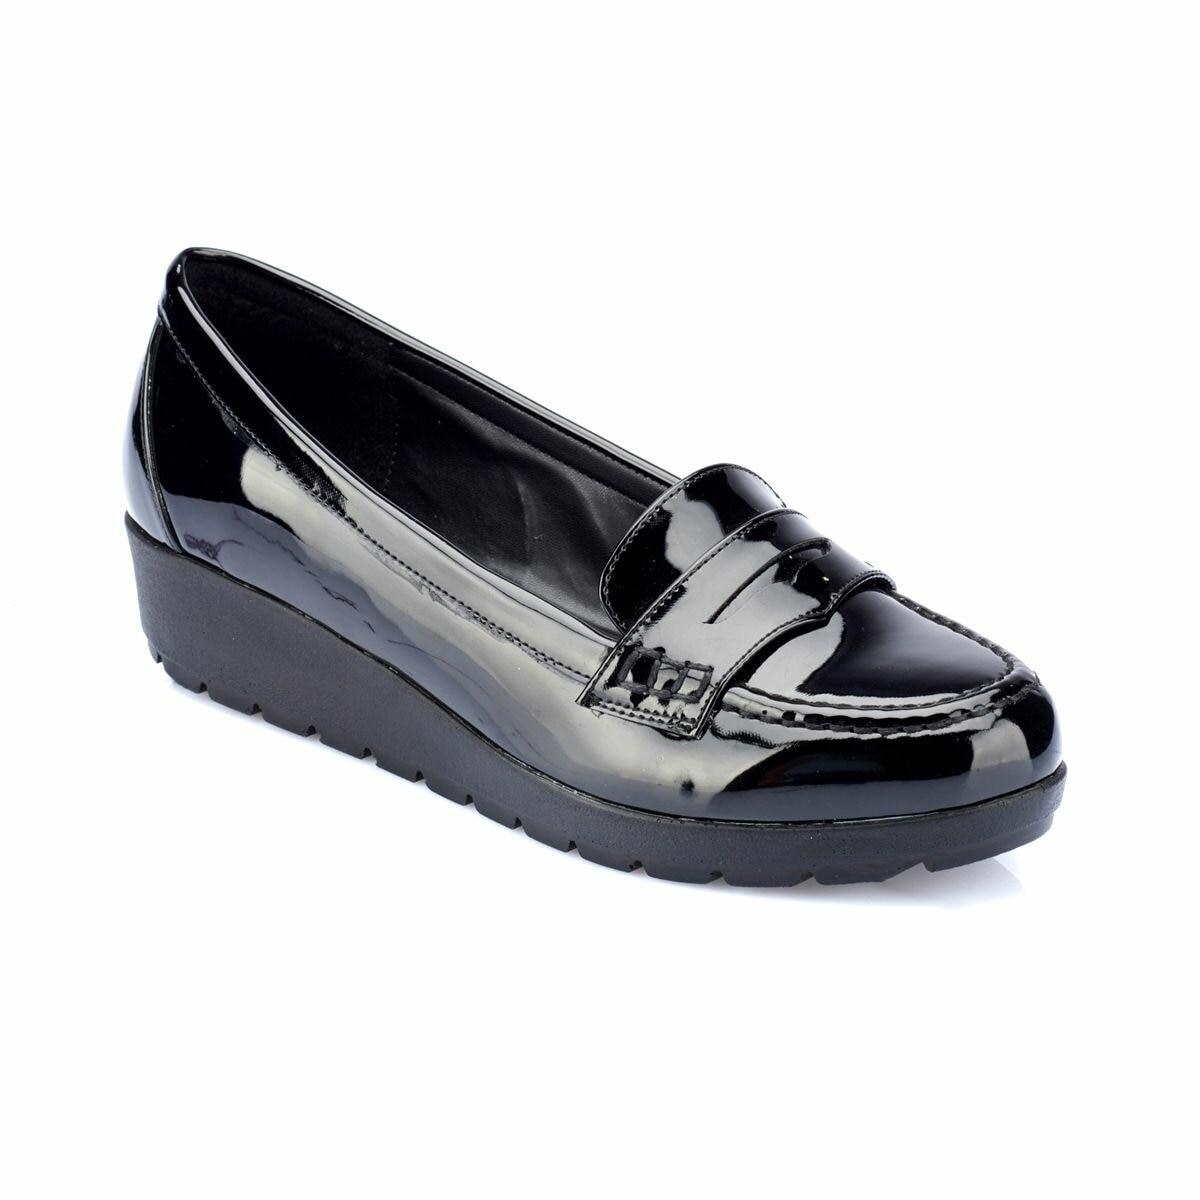 FLO 82.156027.Z Black Women Shoes Polaris